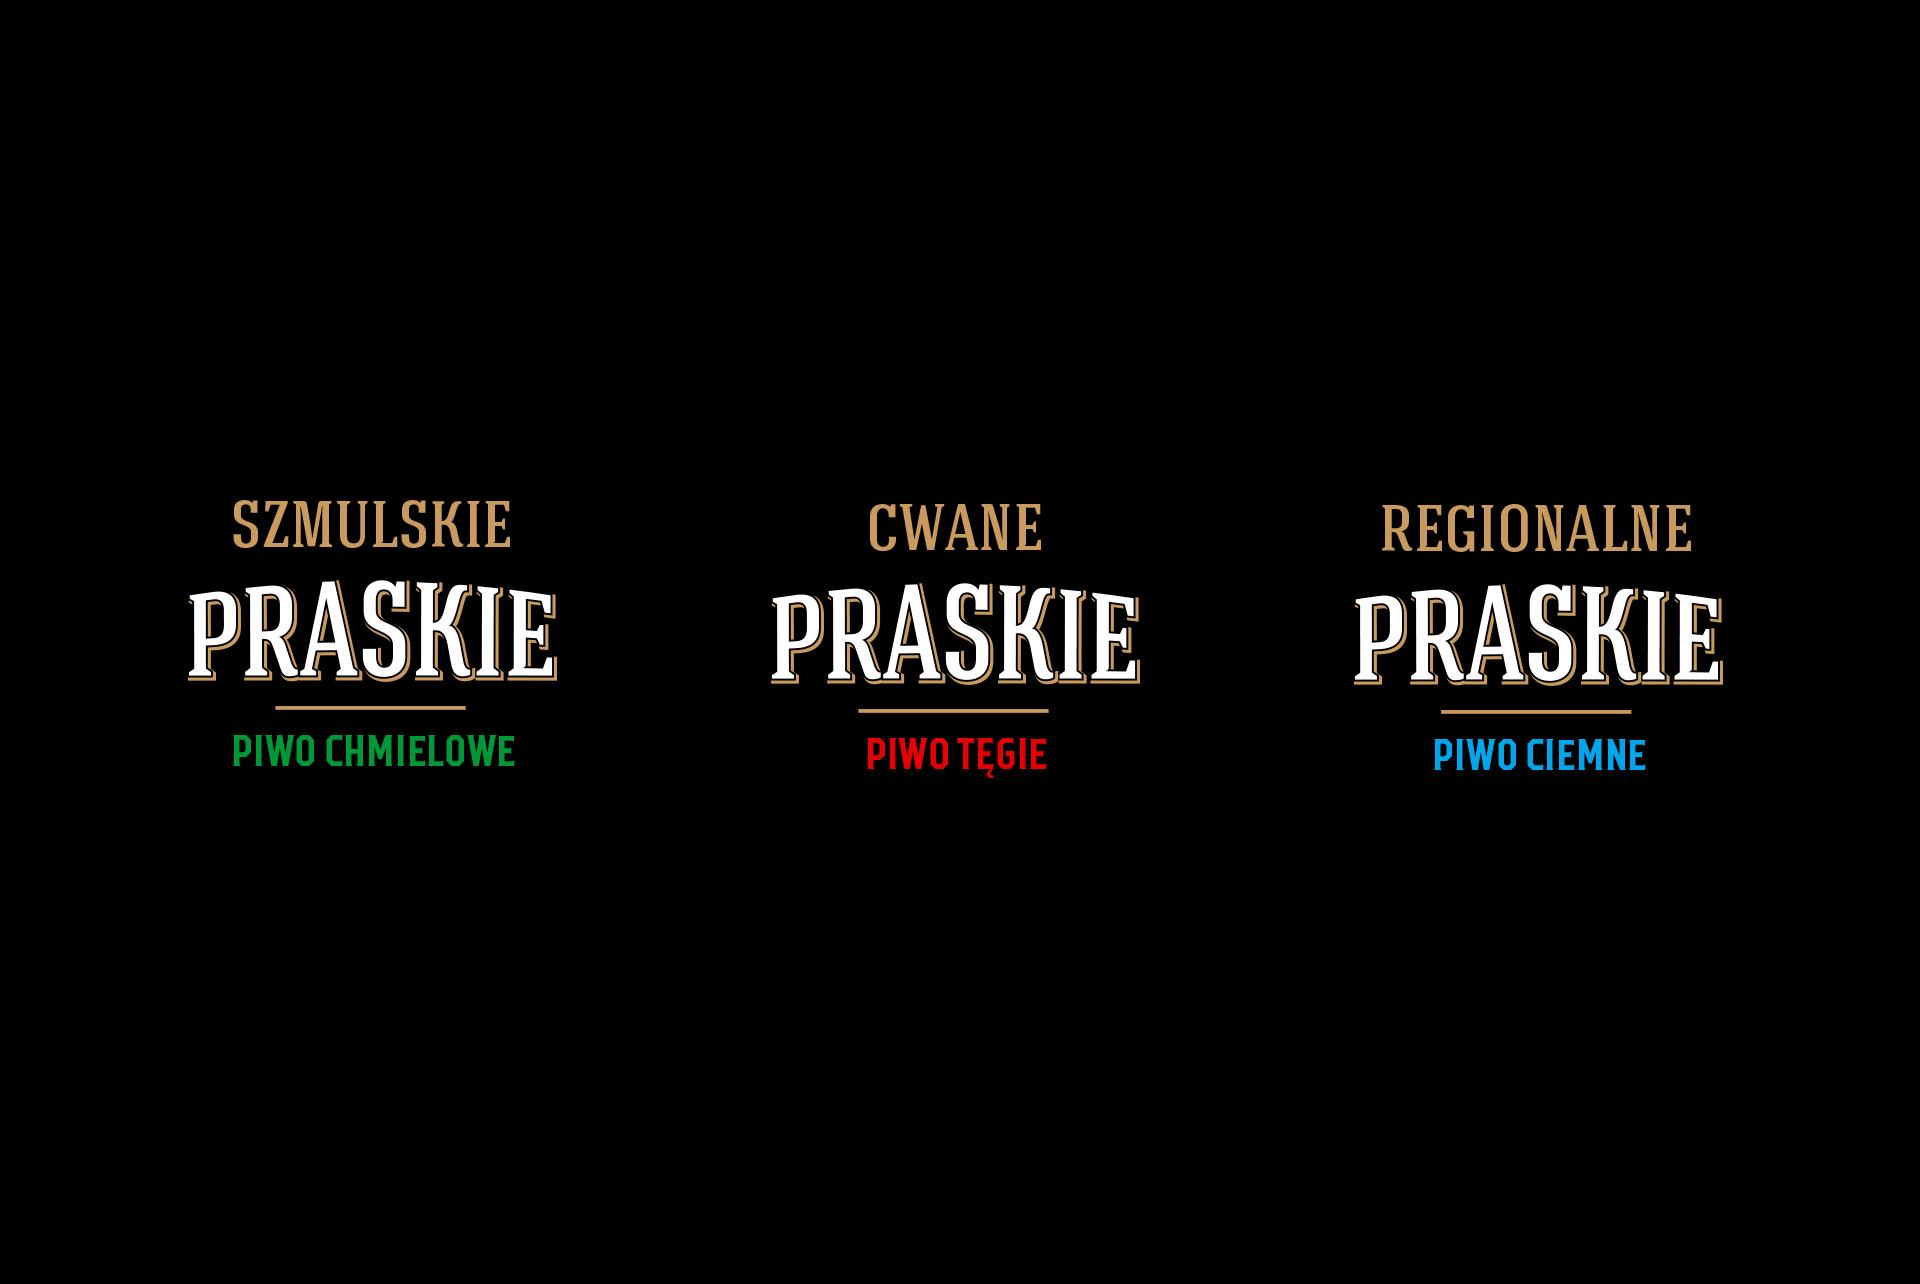 Praskie Beer Logo Design